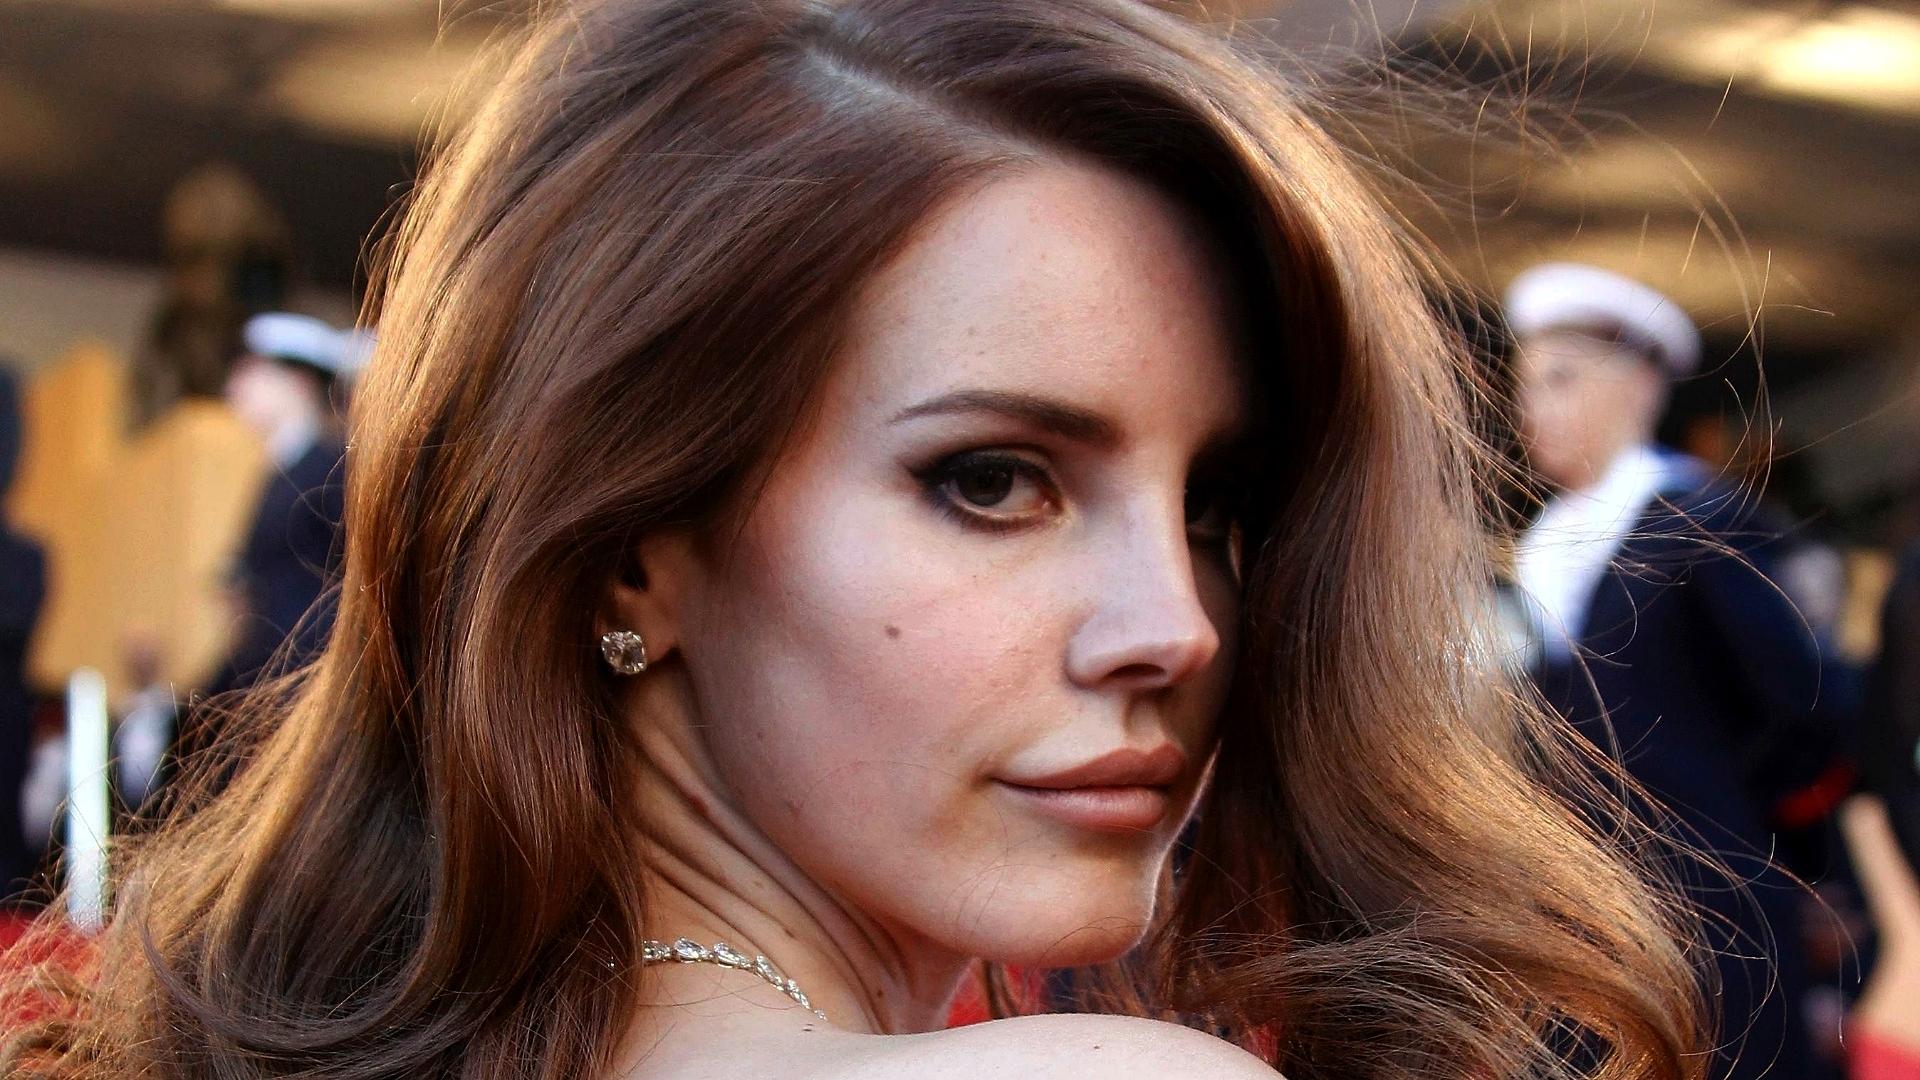 Lana Del Rey Wallpapers Hd